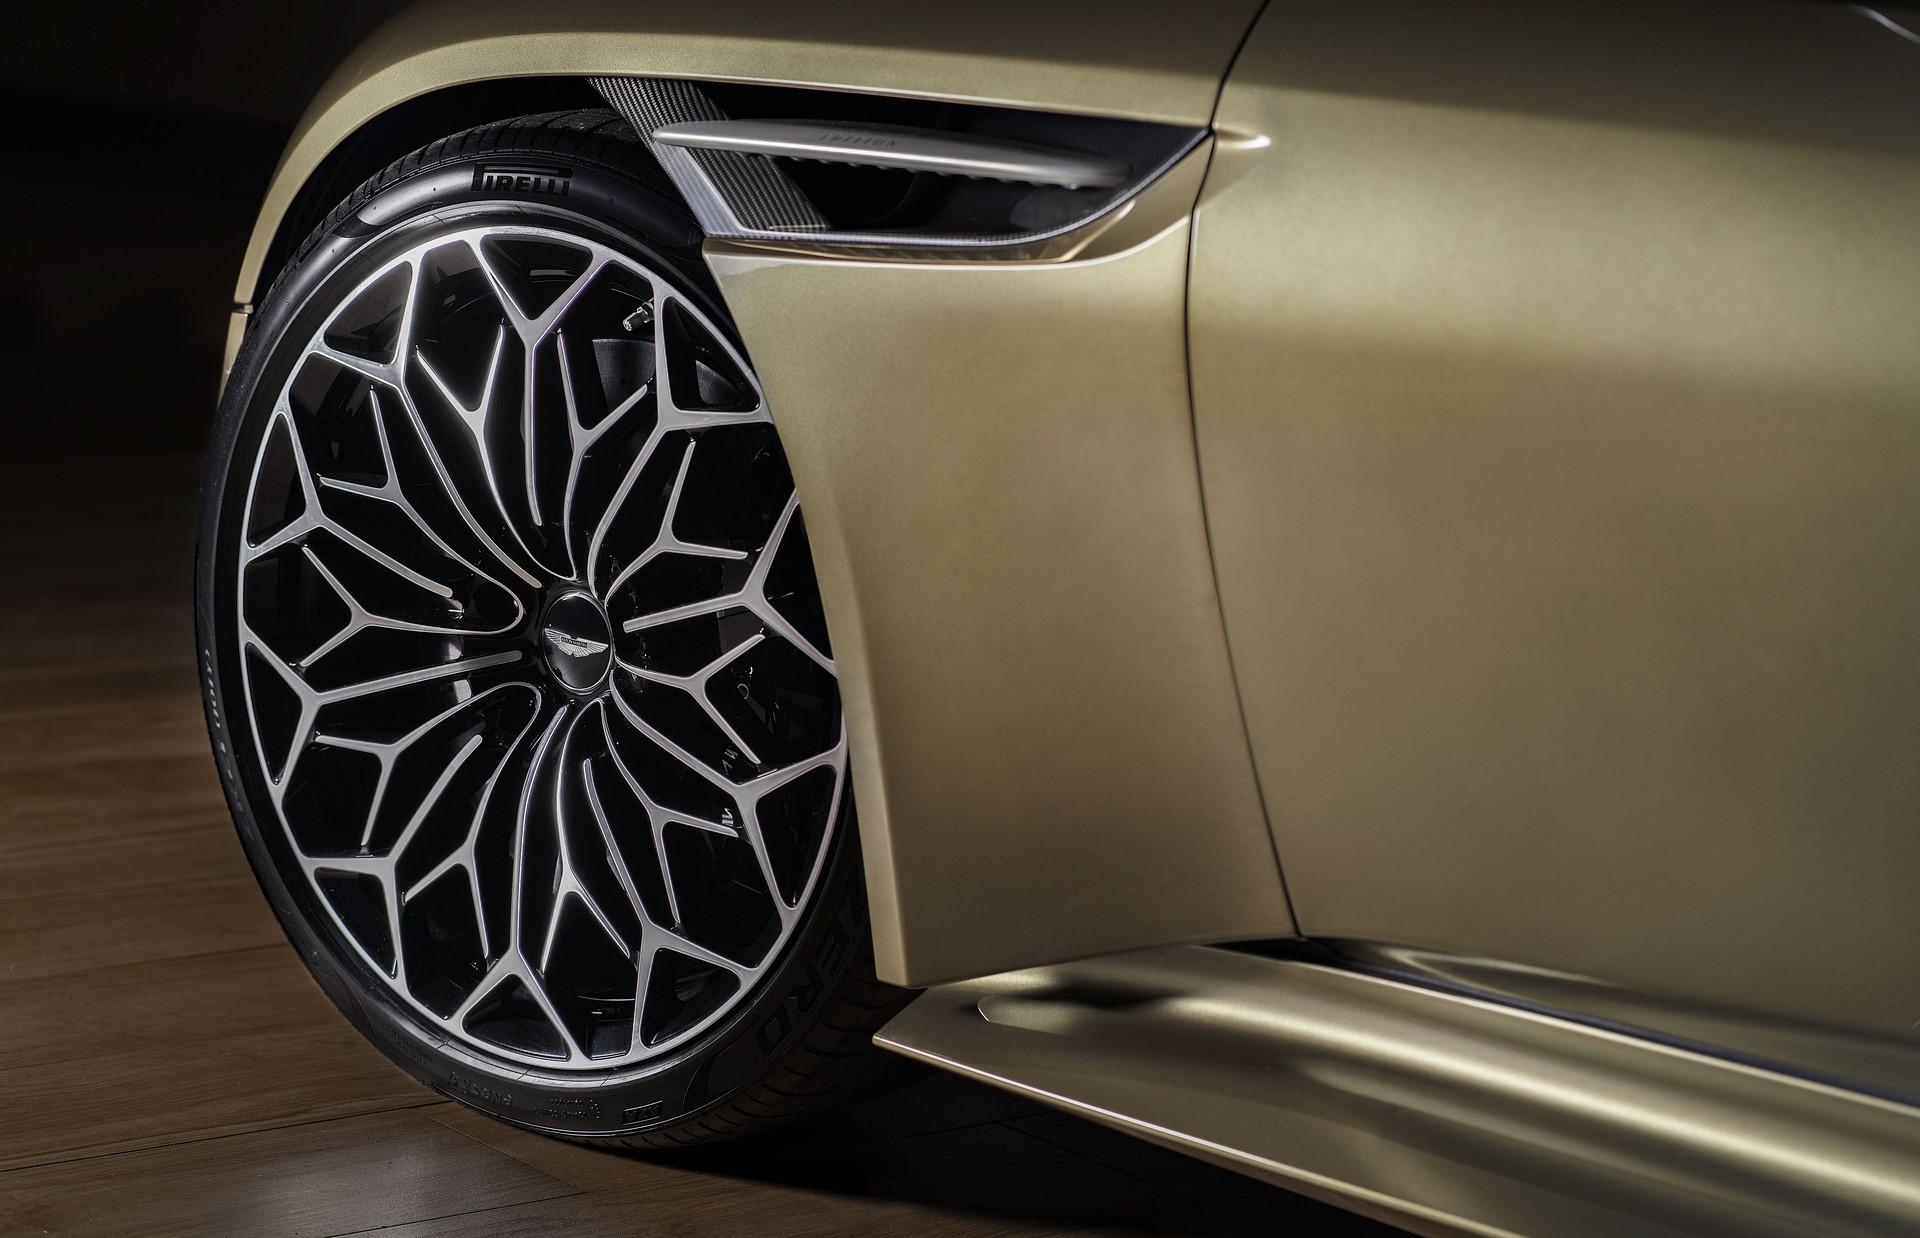 Aston-Martin-DBS-Superleggera-James-Bond-Special-Edition-10